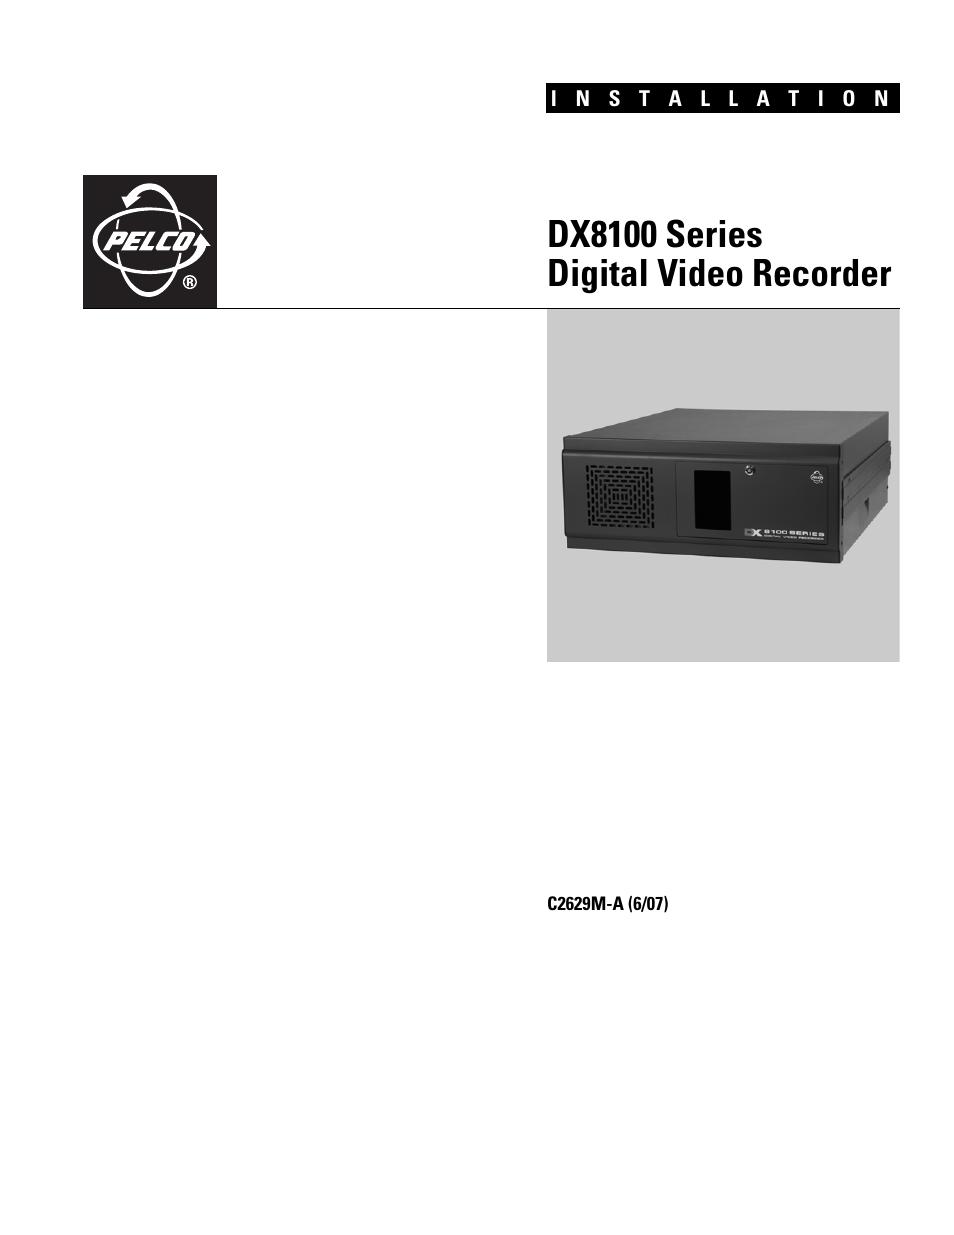 pelco dx8100 user manual 92 pages rh manualsdir com Pelco 16 Channel DVR Pelco DX Client Series